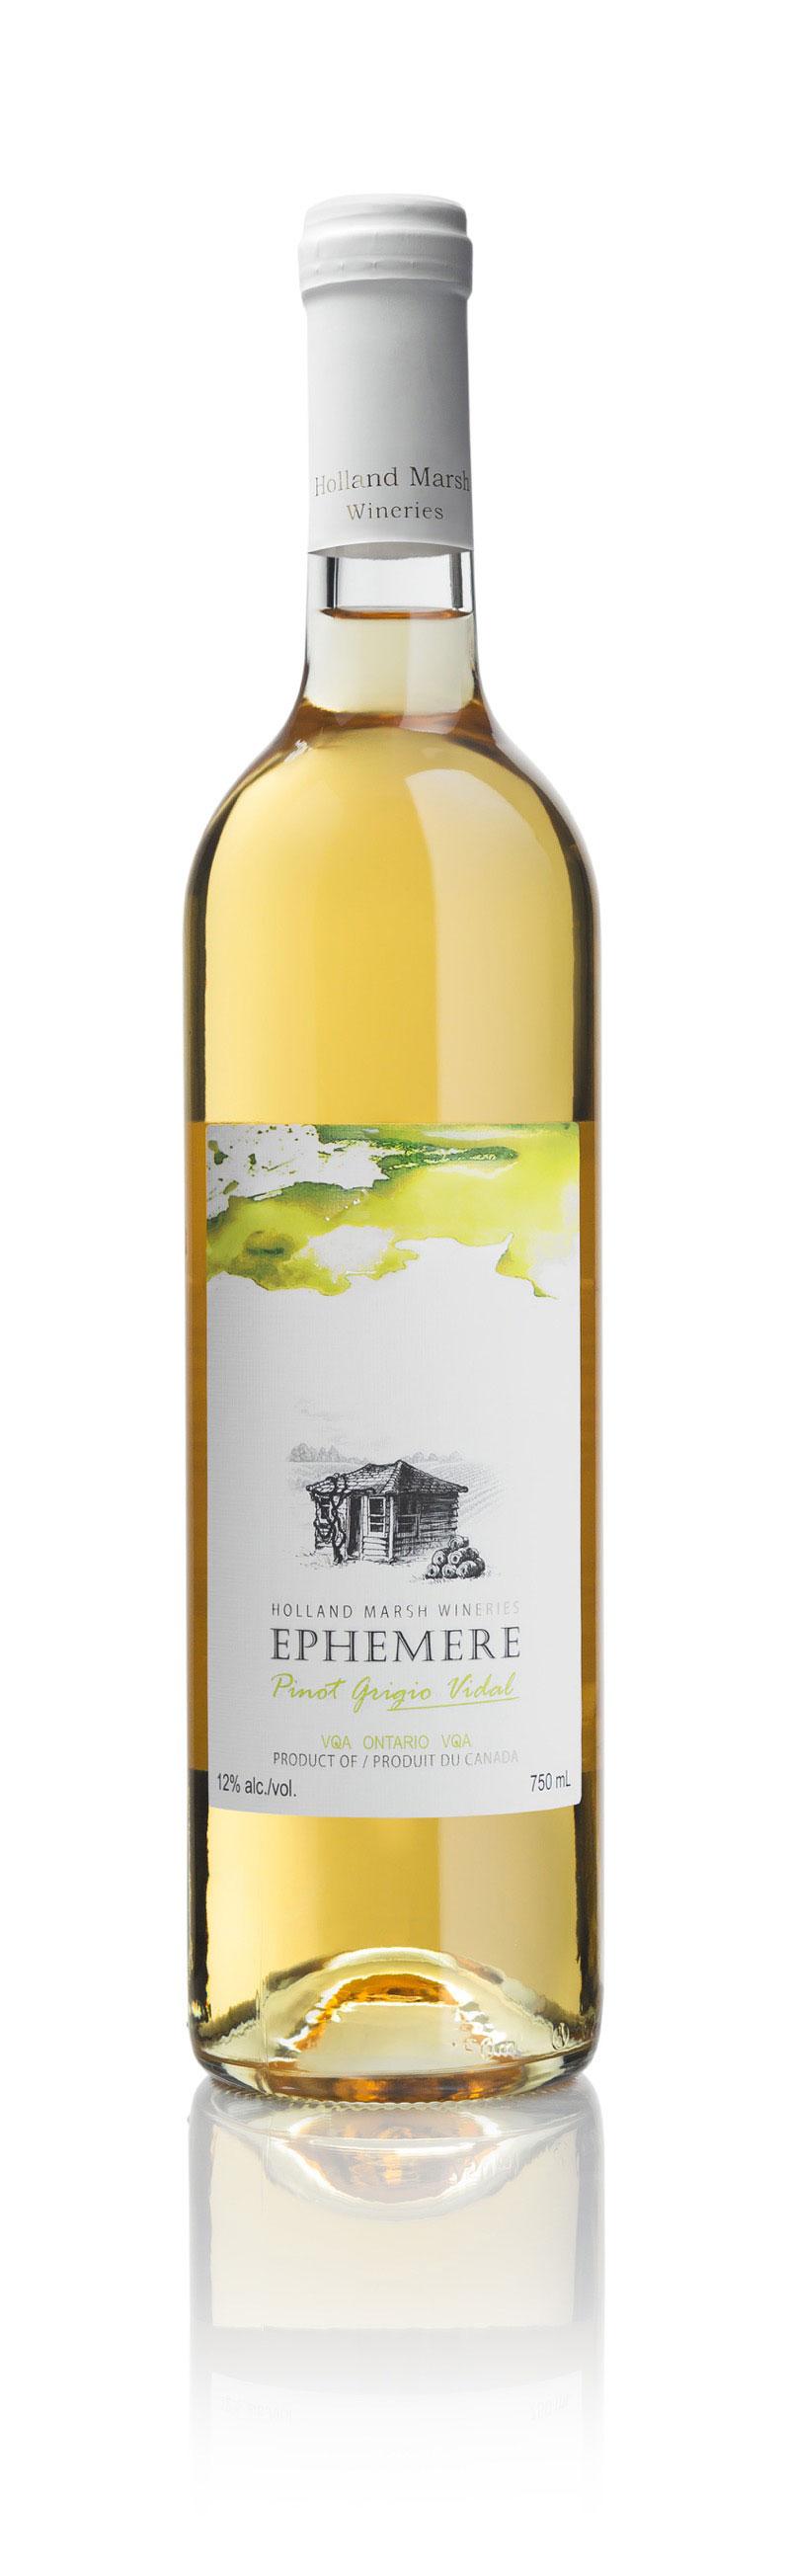 2016 Ephemere Pinot Grigio Vidal